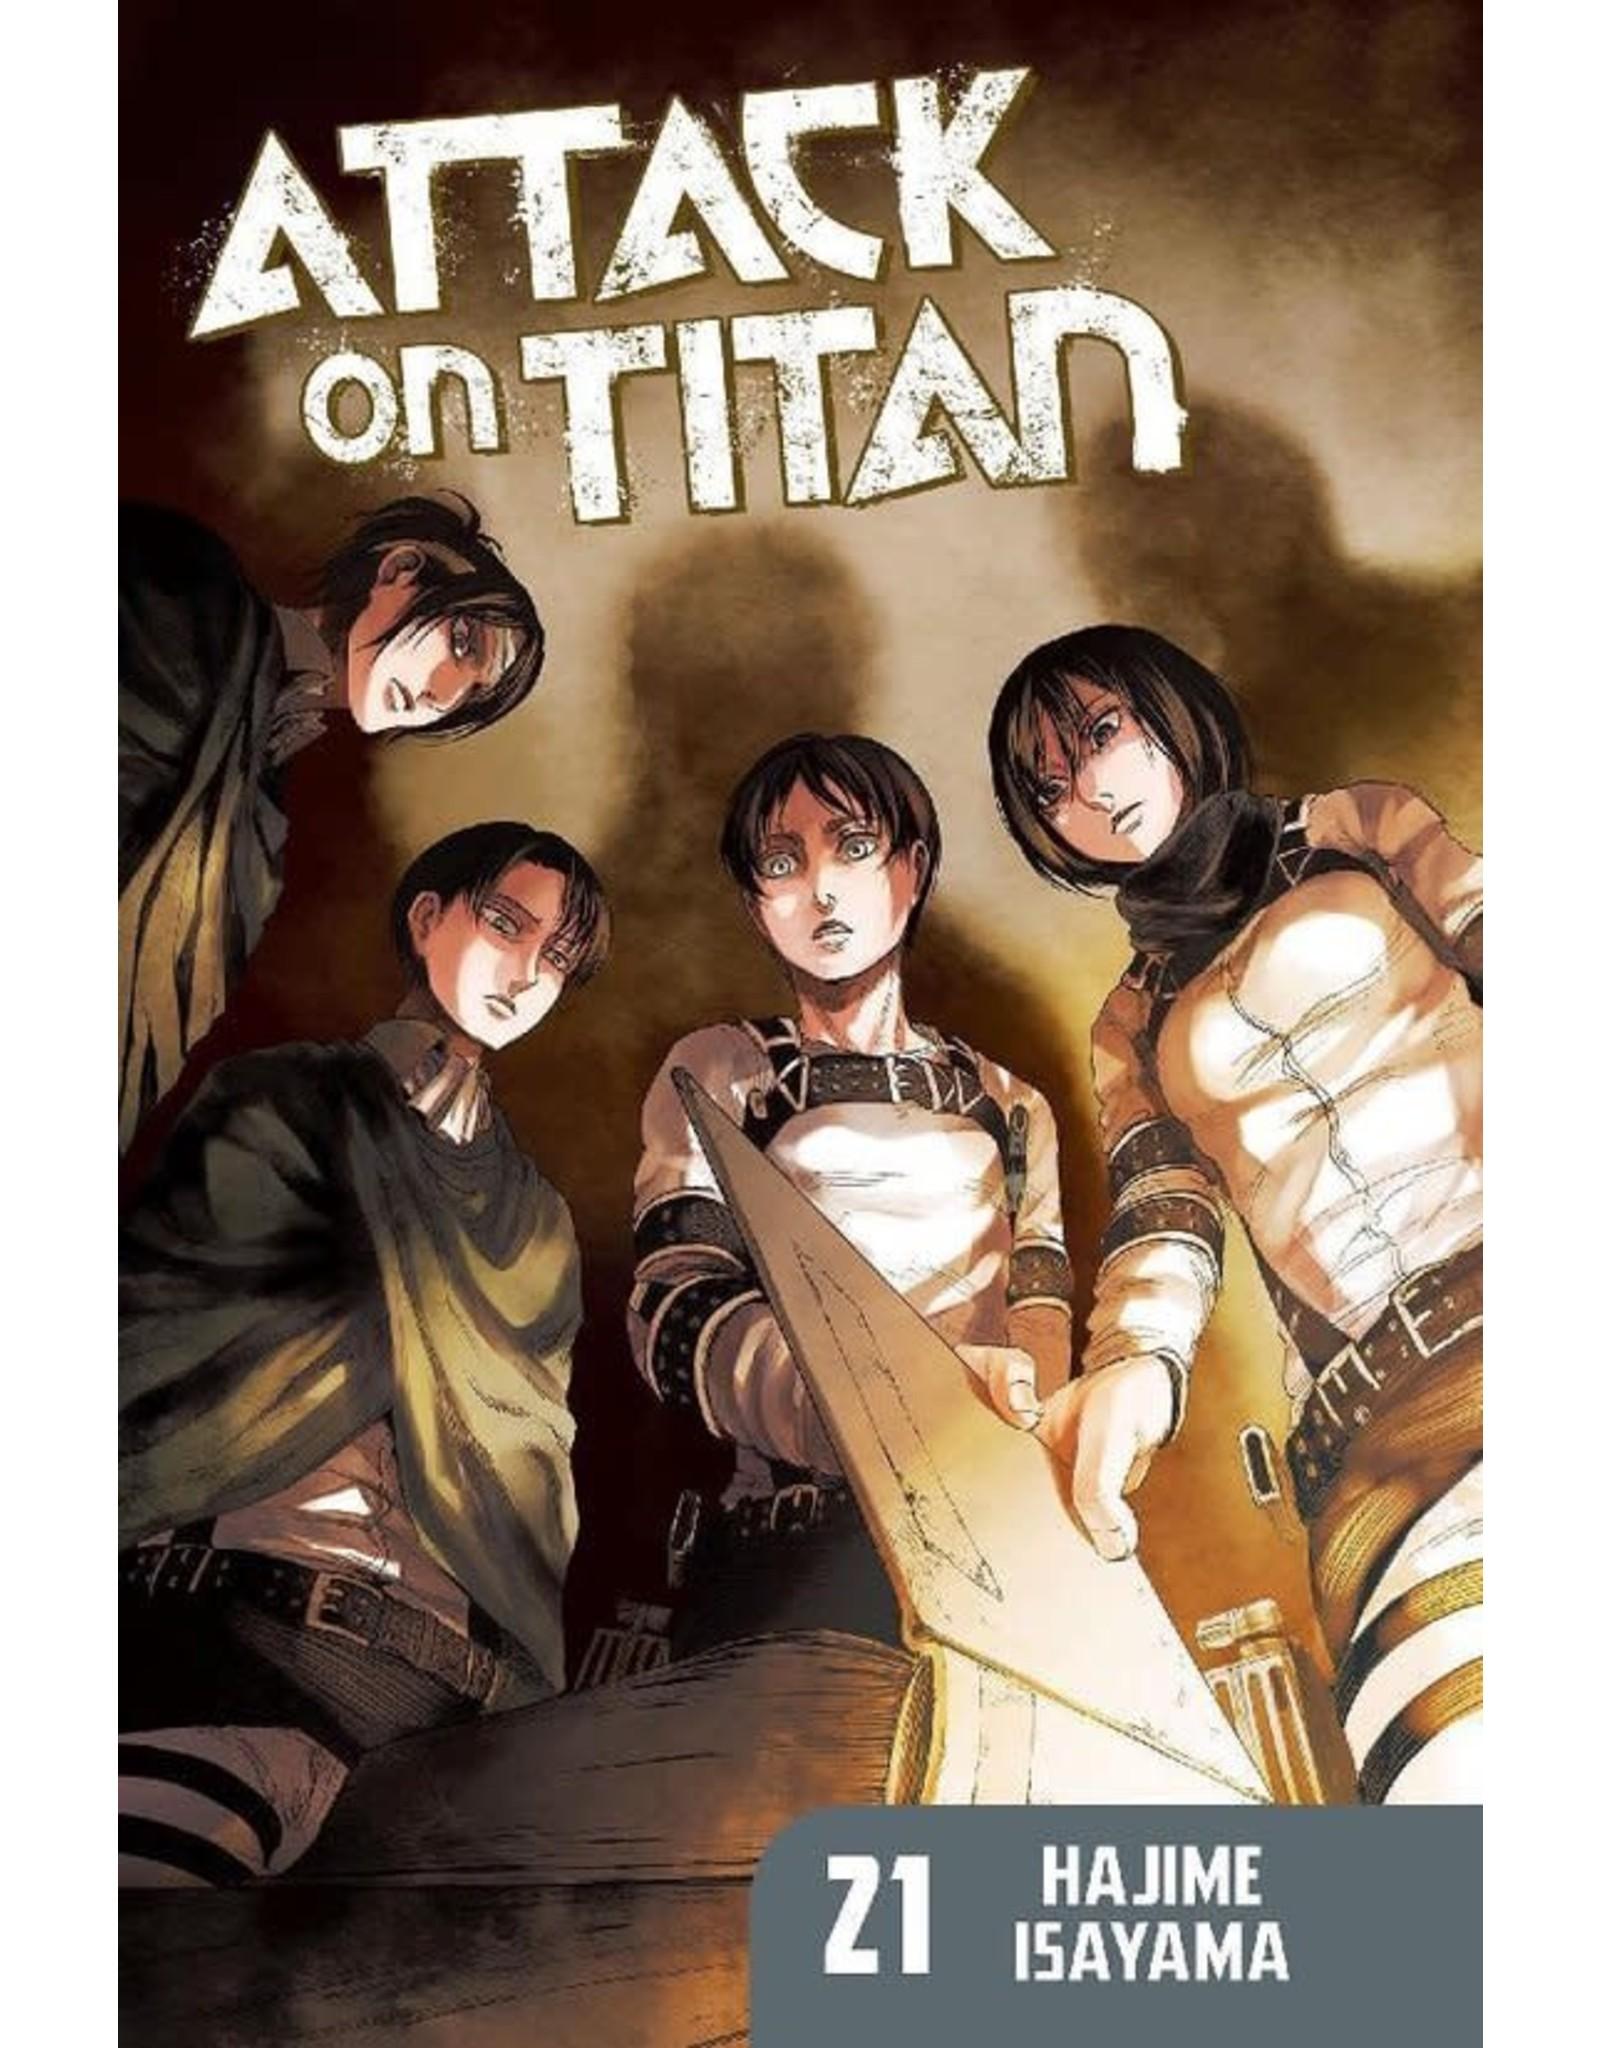 Attack on Titan 21 (English) - Manga